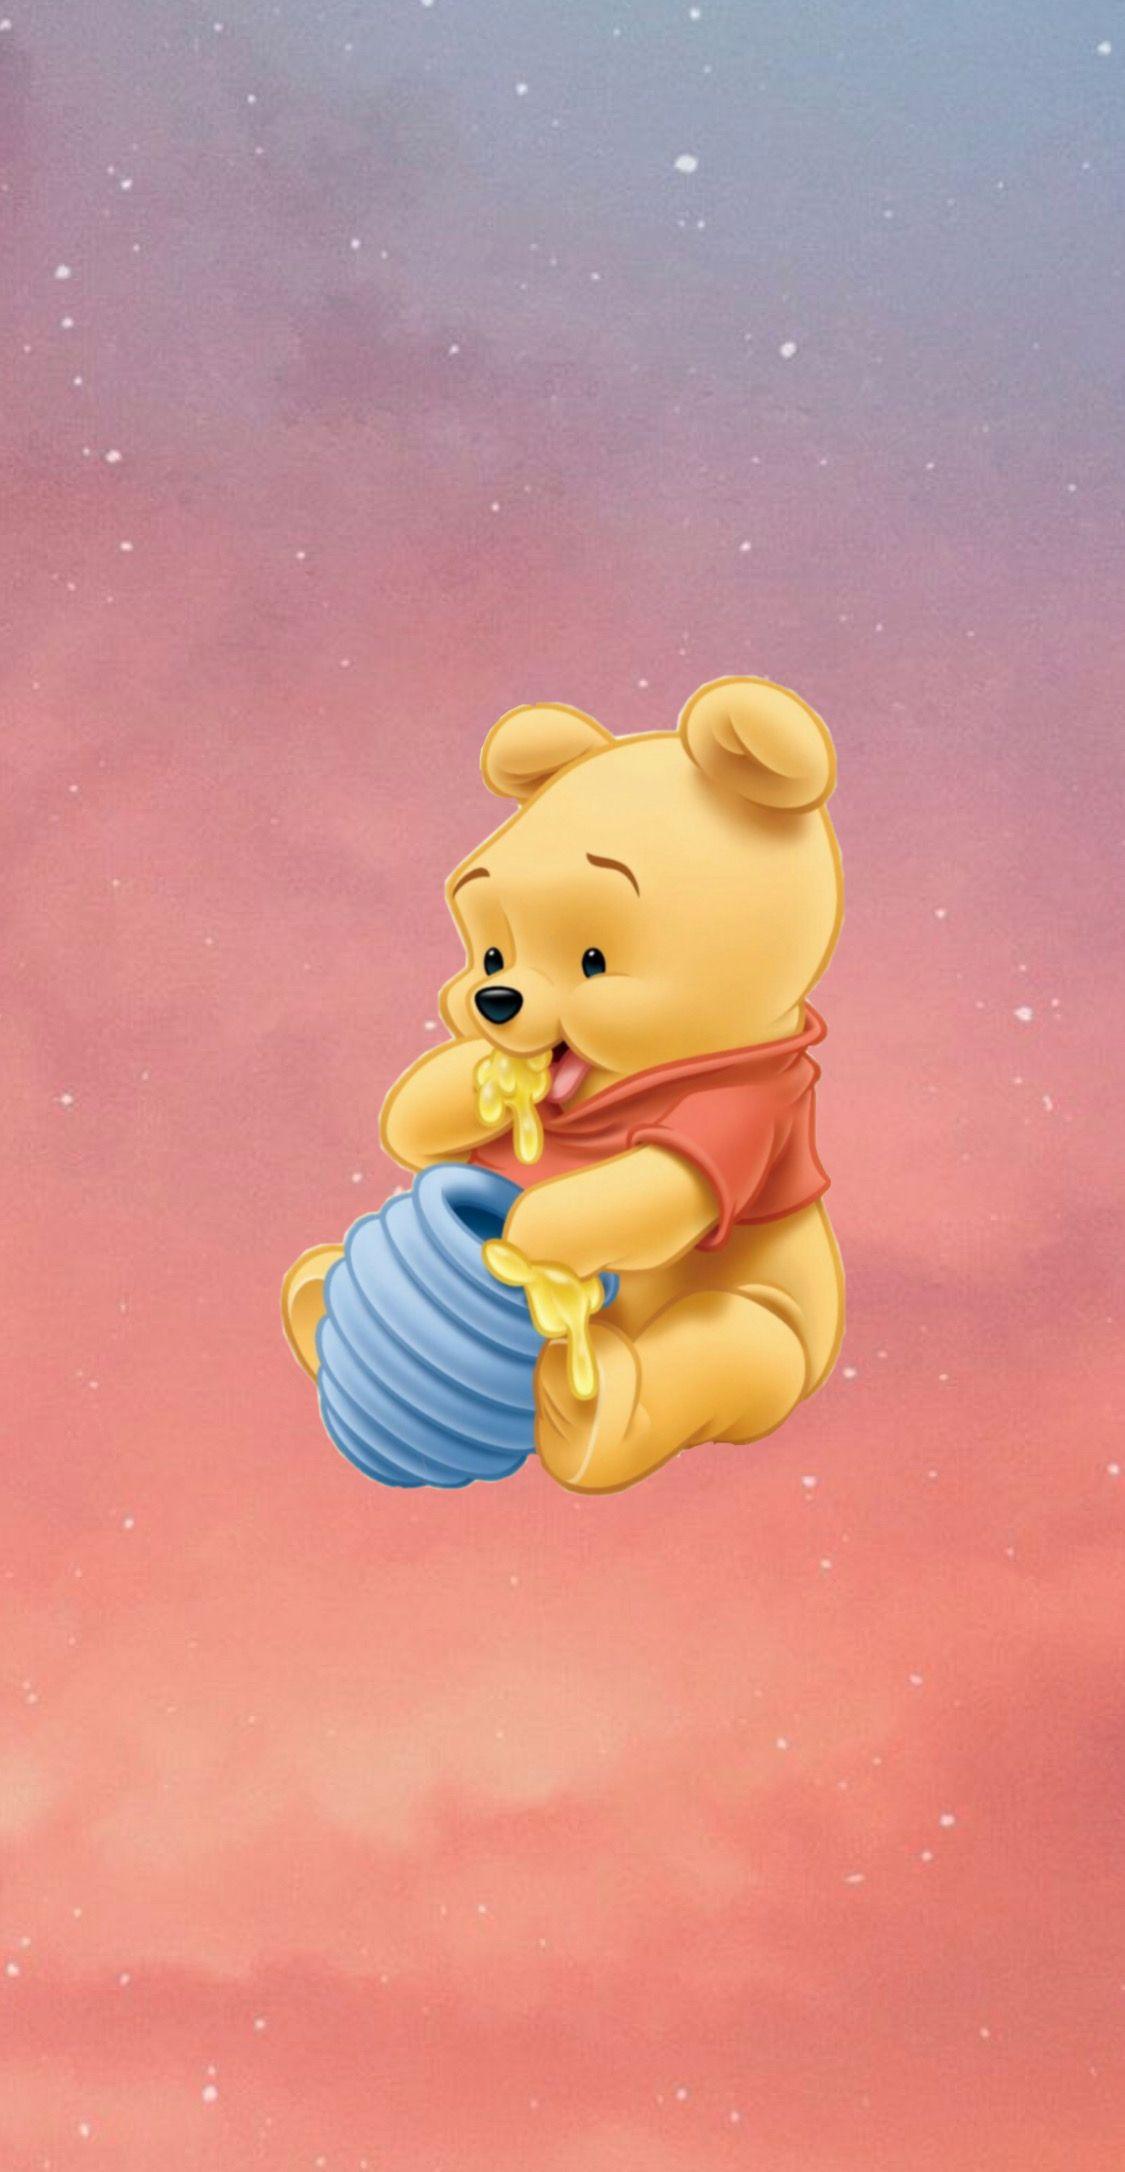 Winnie The Pooh Cute Cartoon Wallpapers Winnie The Pooh Cartoon Cute Disney Characters